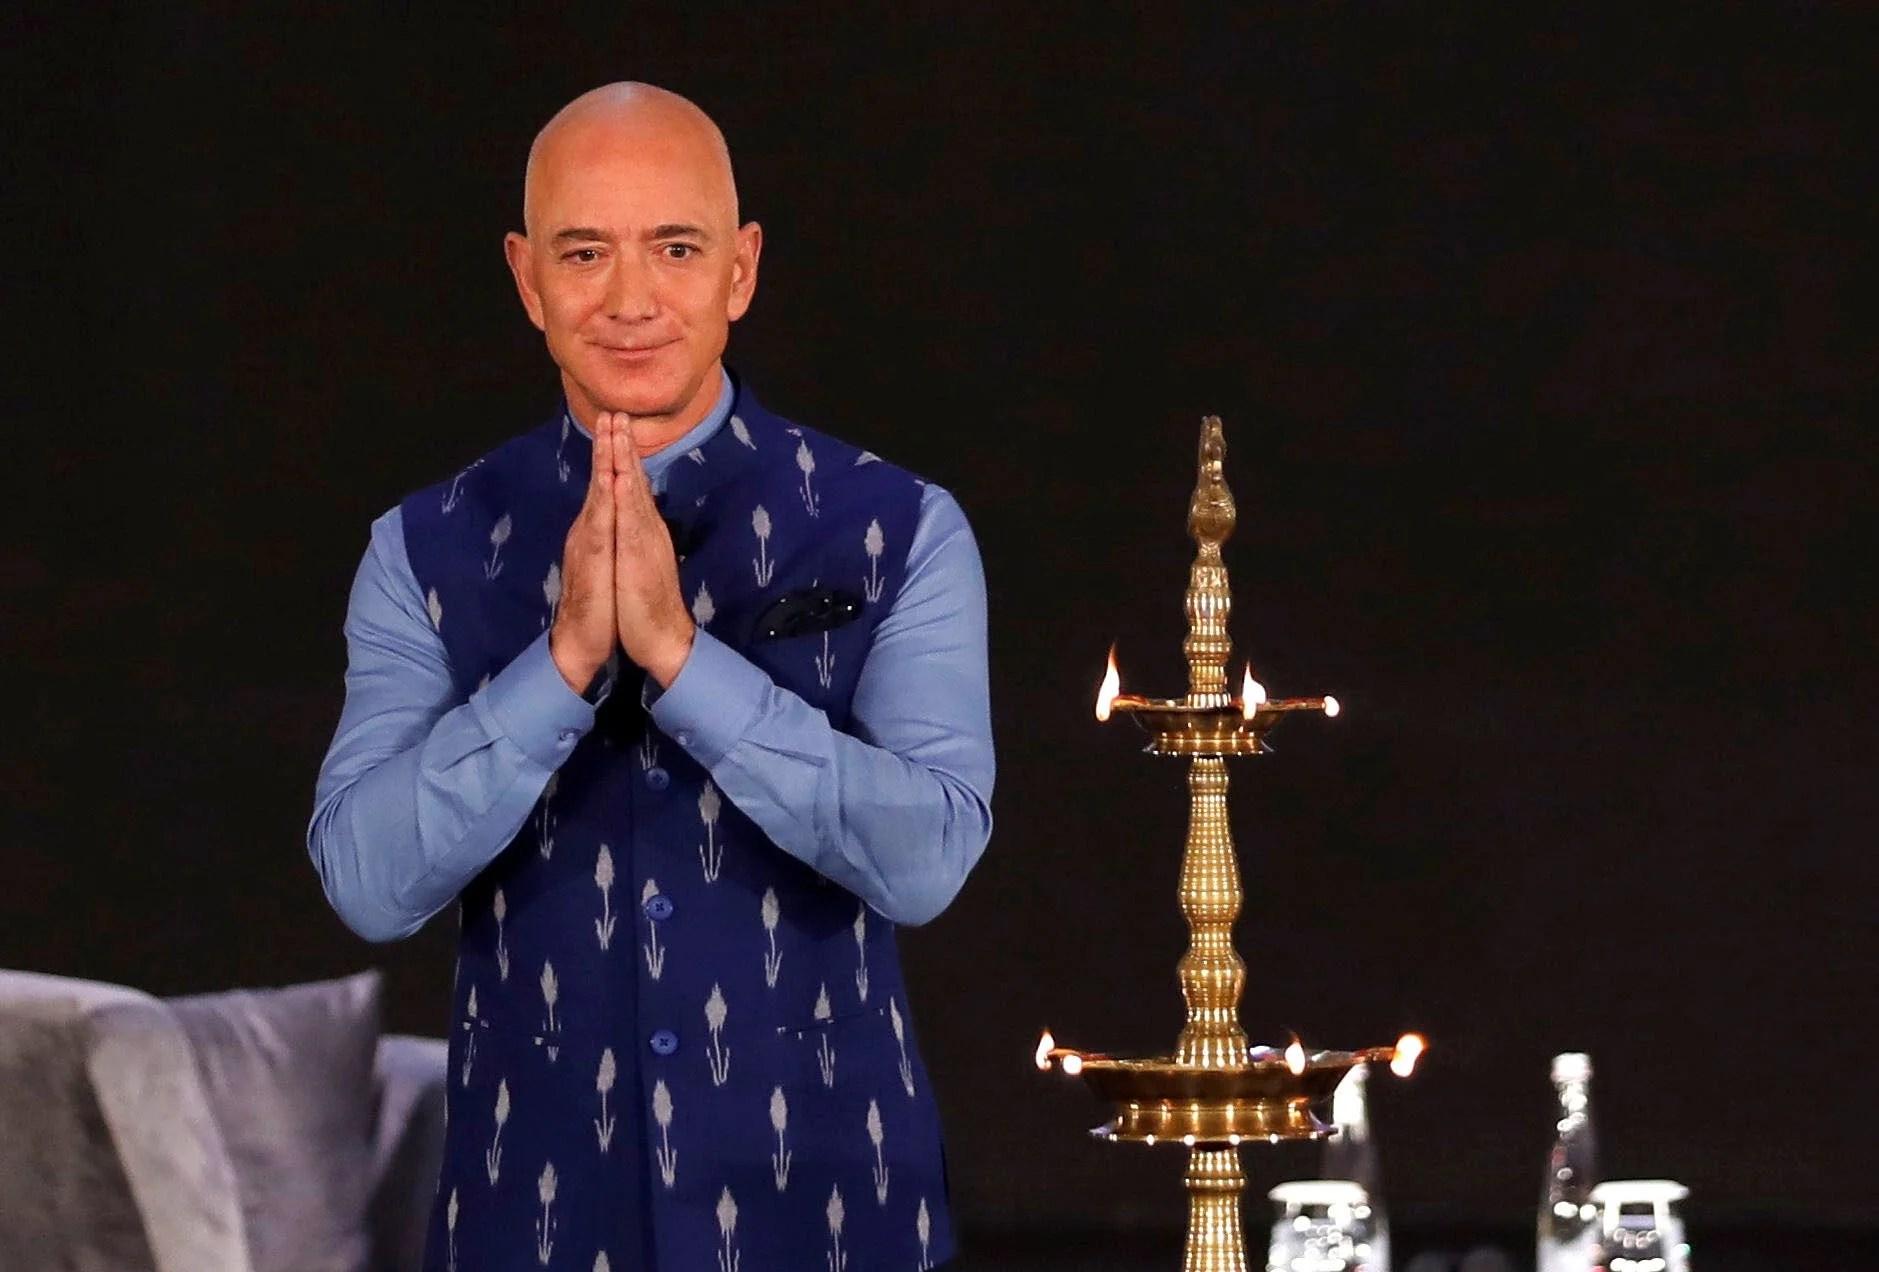 Amazon promises to create 1 million jobs in India as Jeff Bezos' journey falls into public relations nightmare